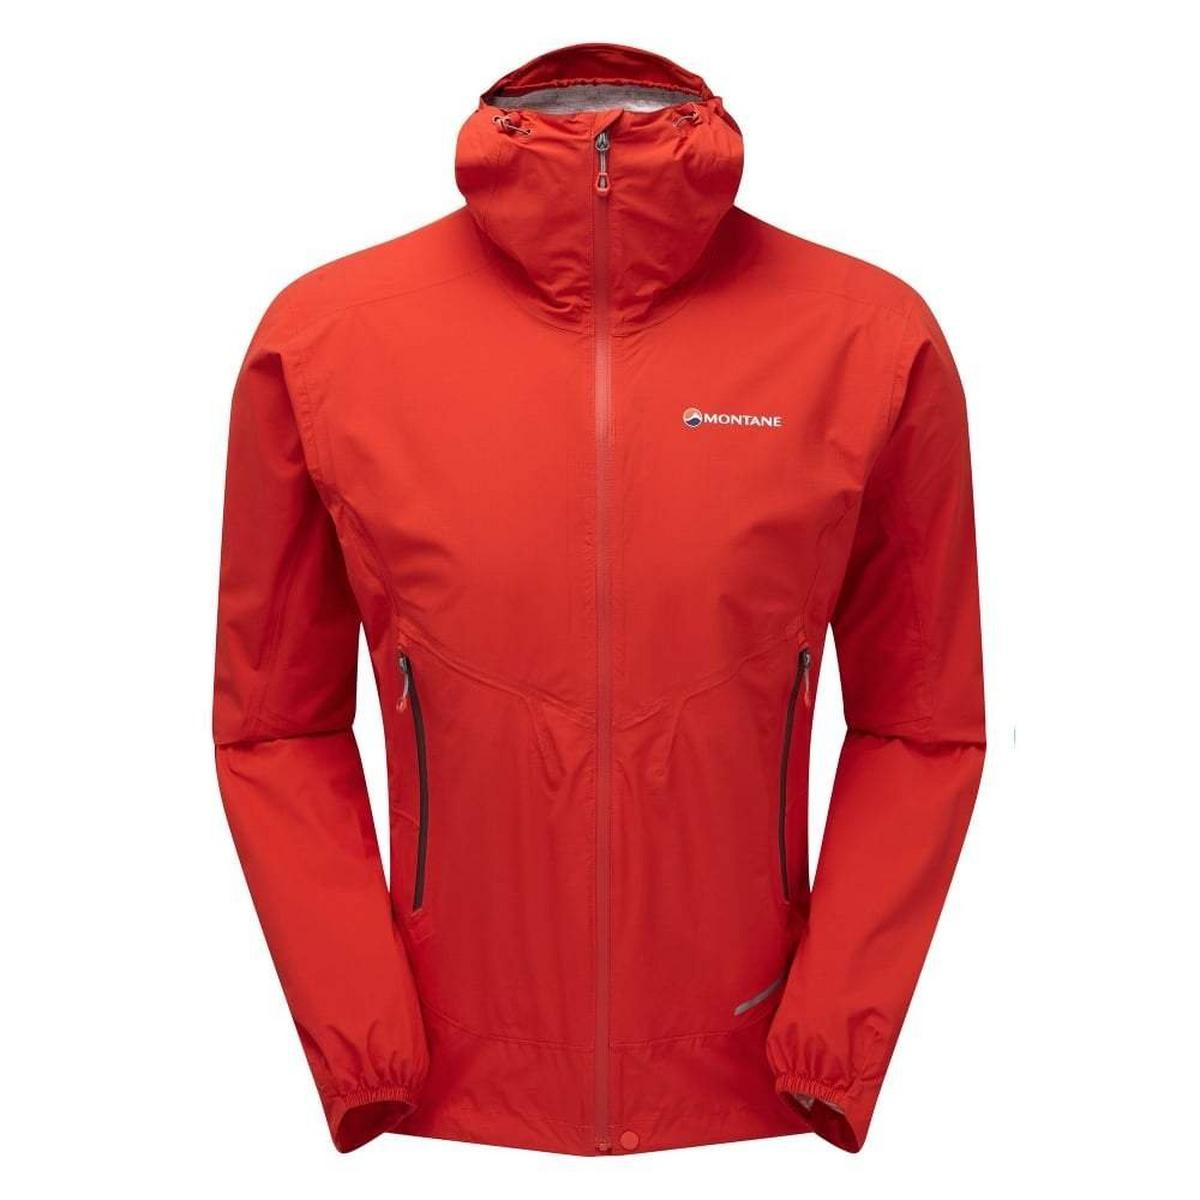 Montane Men's Montane Minimus Stretch Ultra Waterproof Jacket- Red